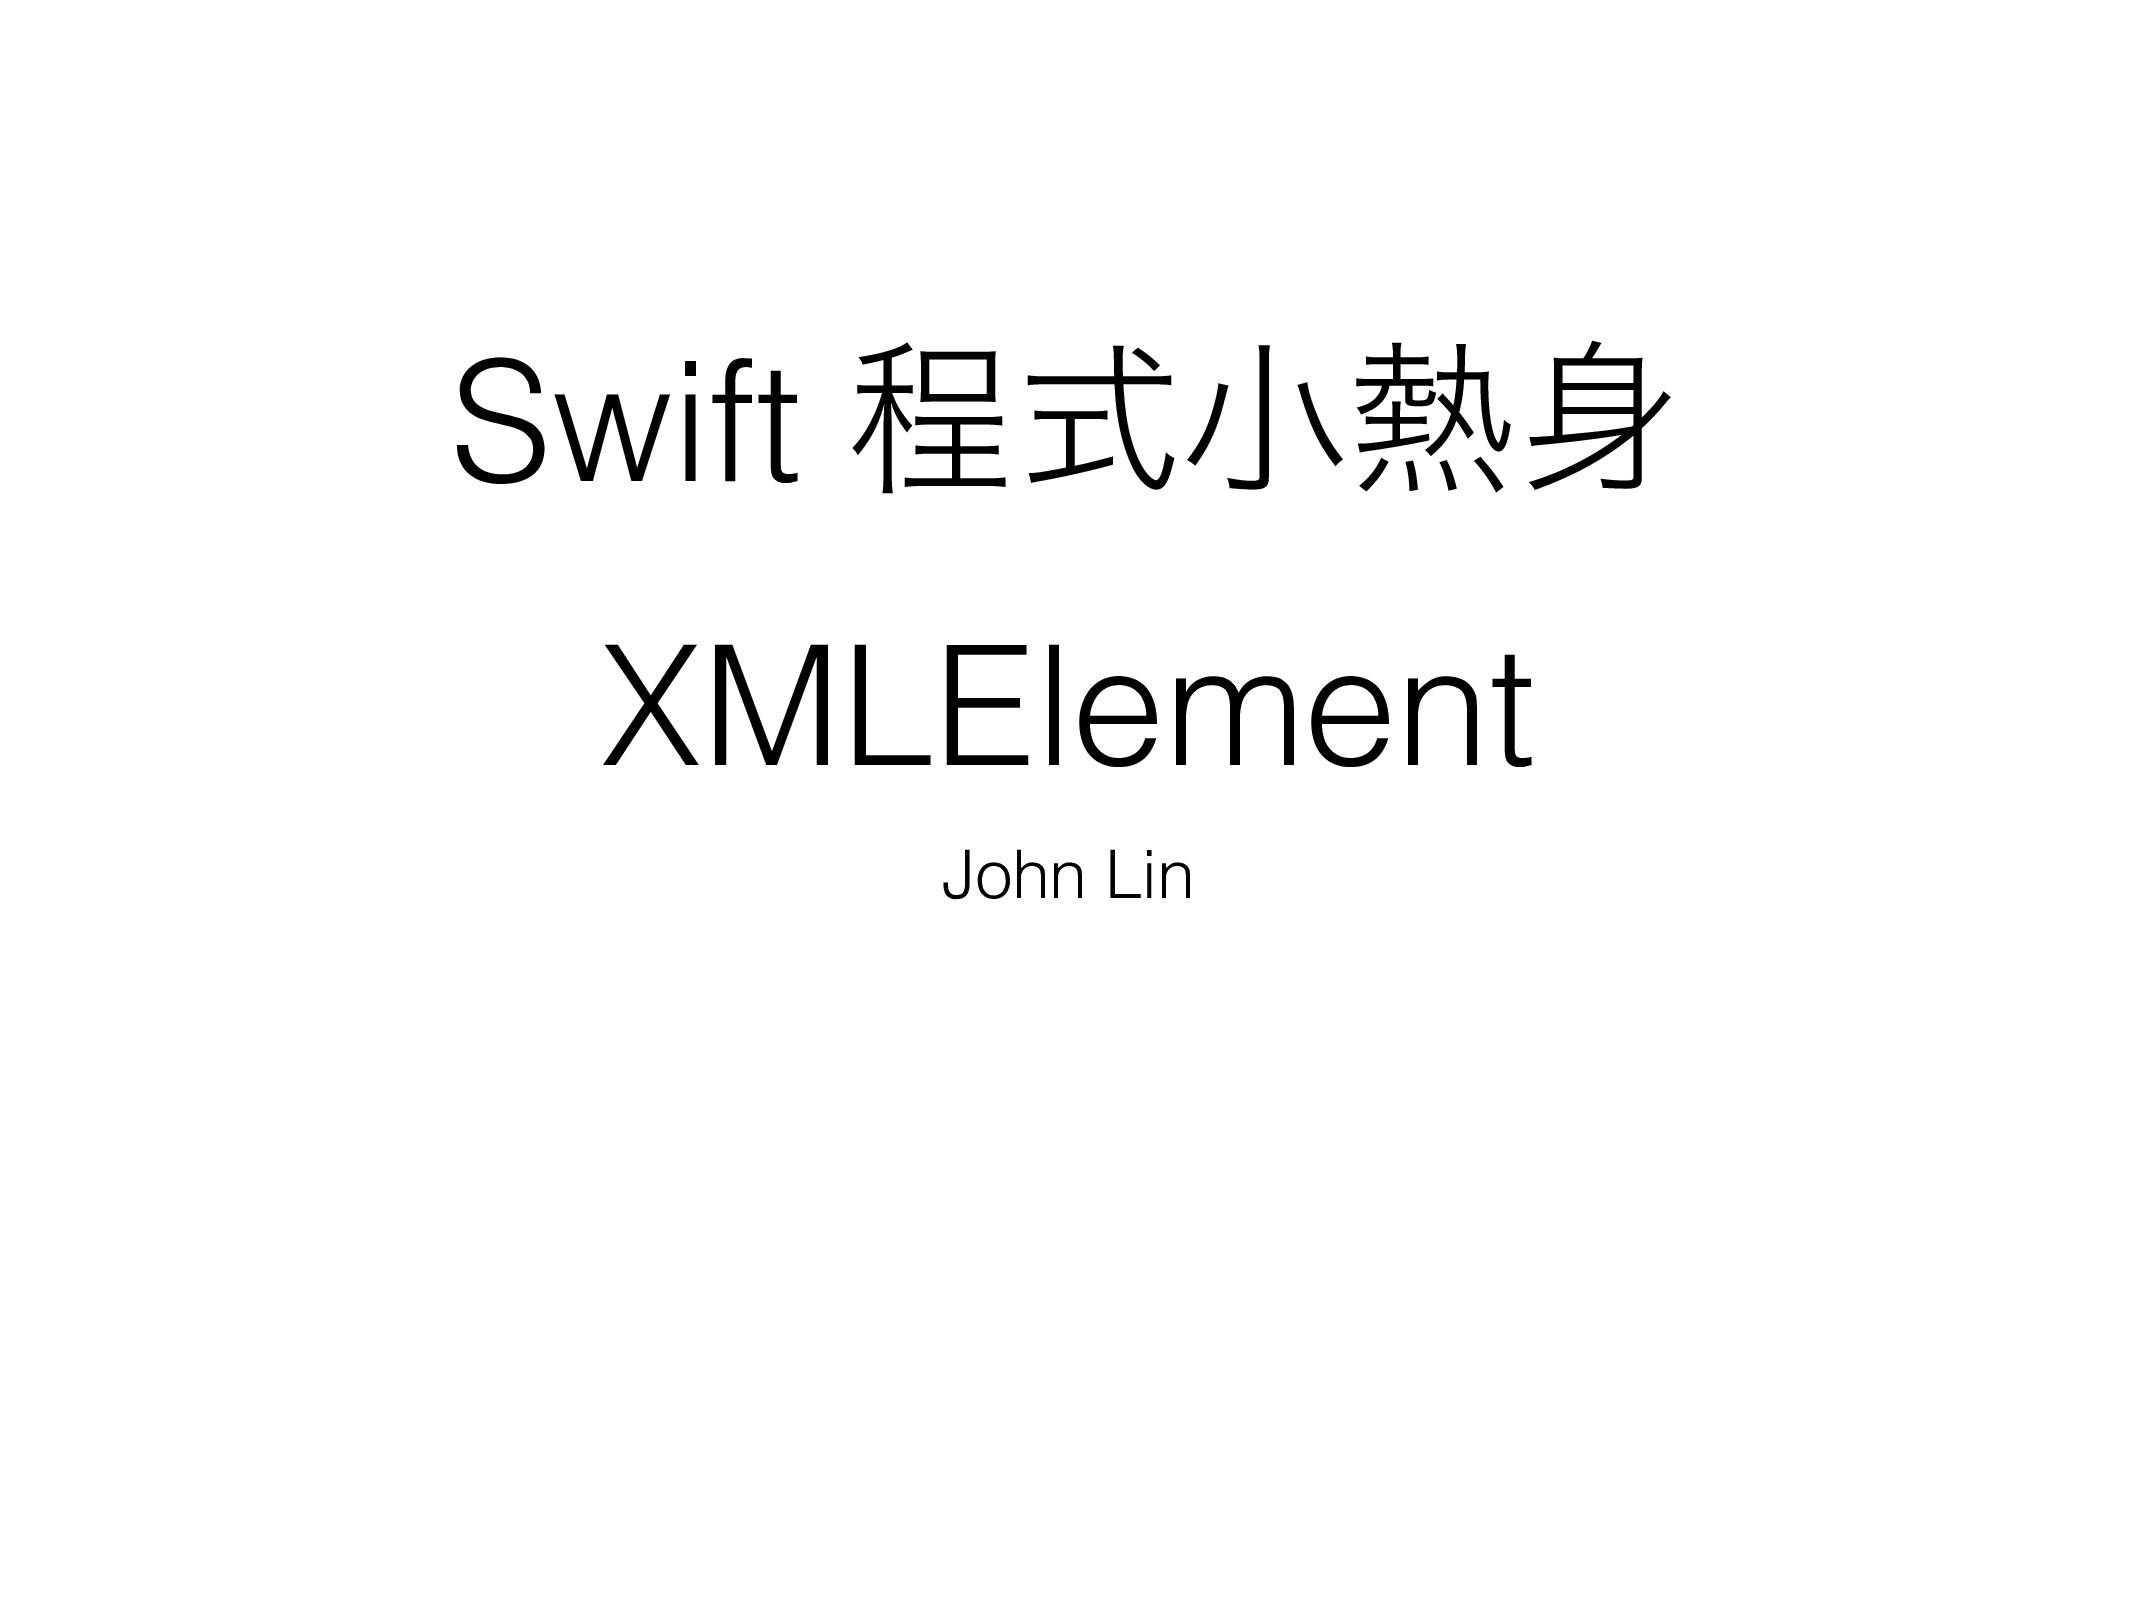 Swift ఔࣜখ XMLElement John Lin